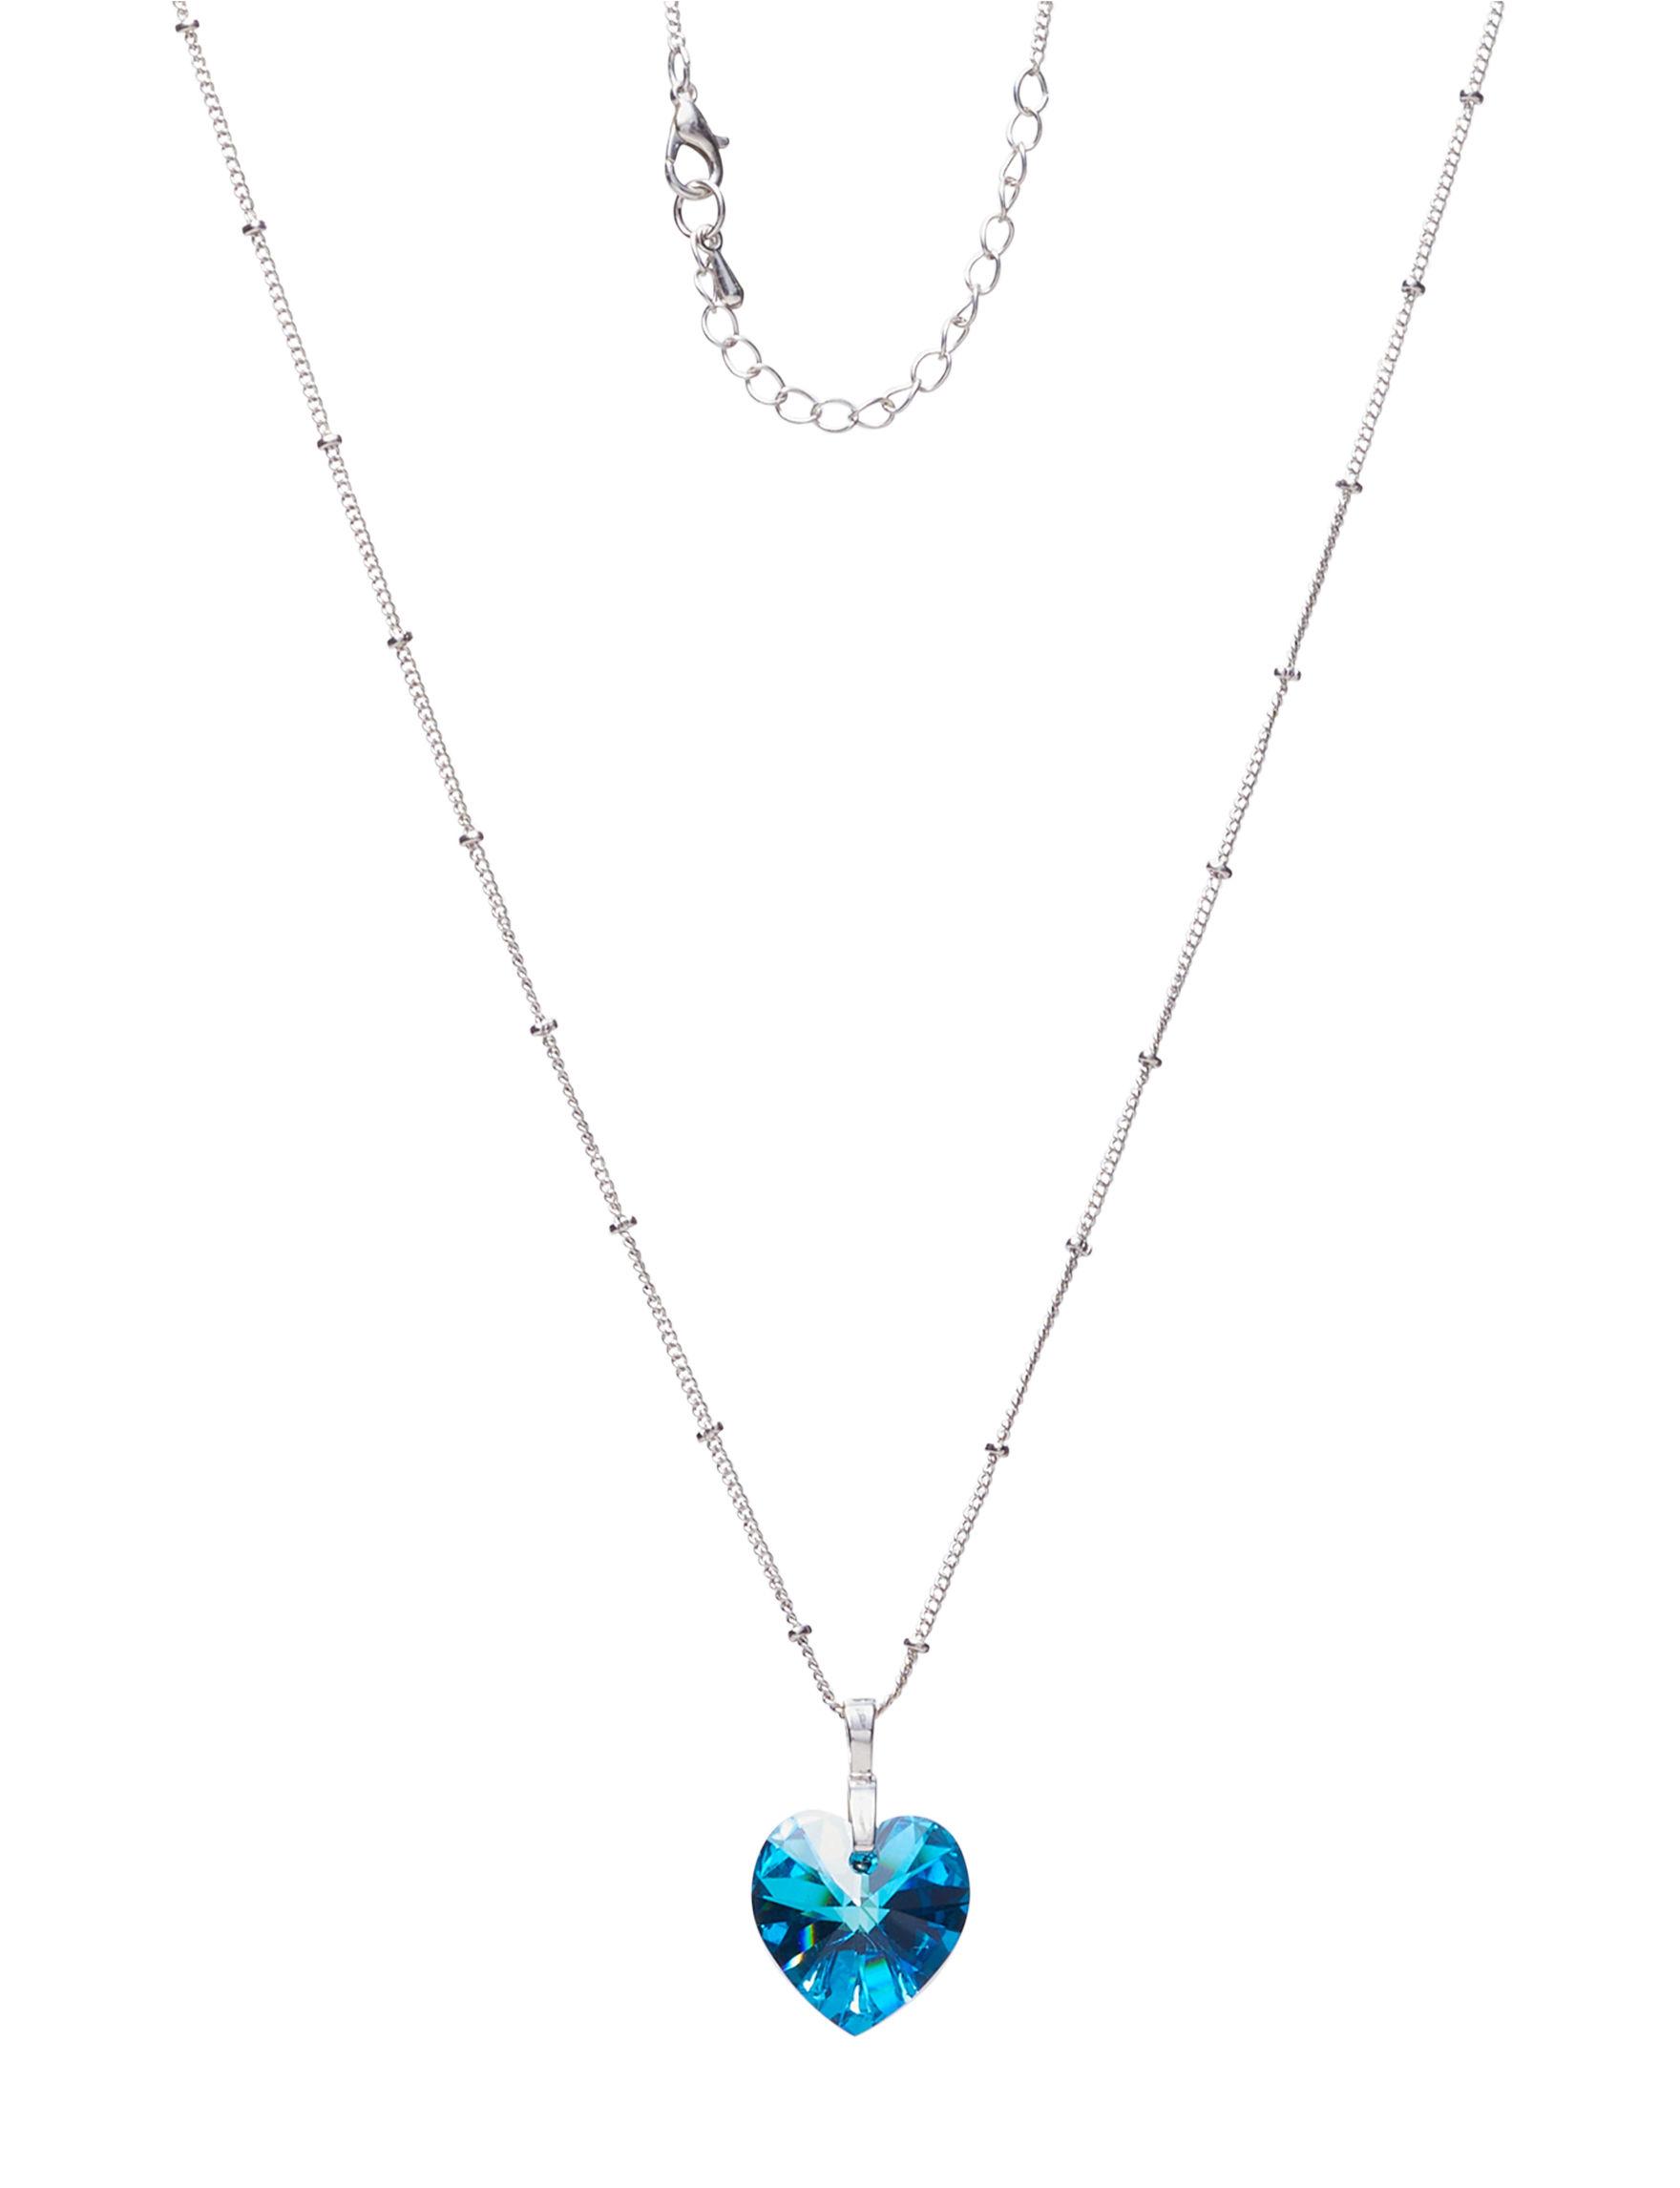 NES Silver / Blue Stone Necklaces & Pendants Fine Jewelry